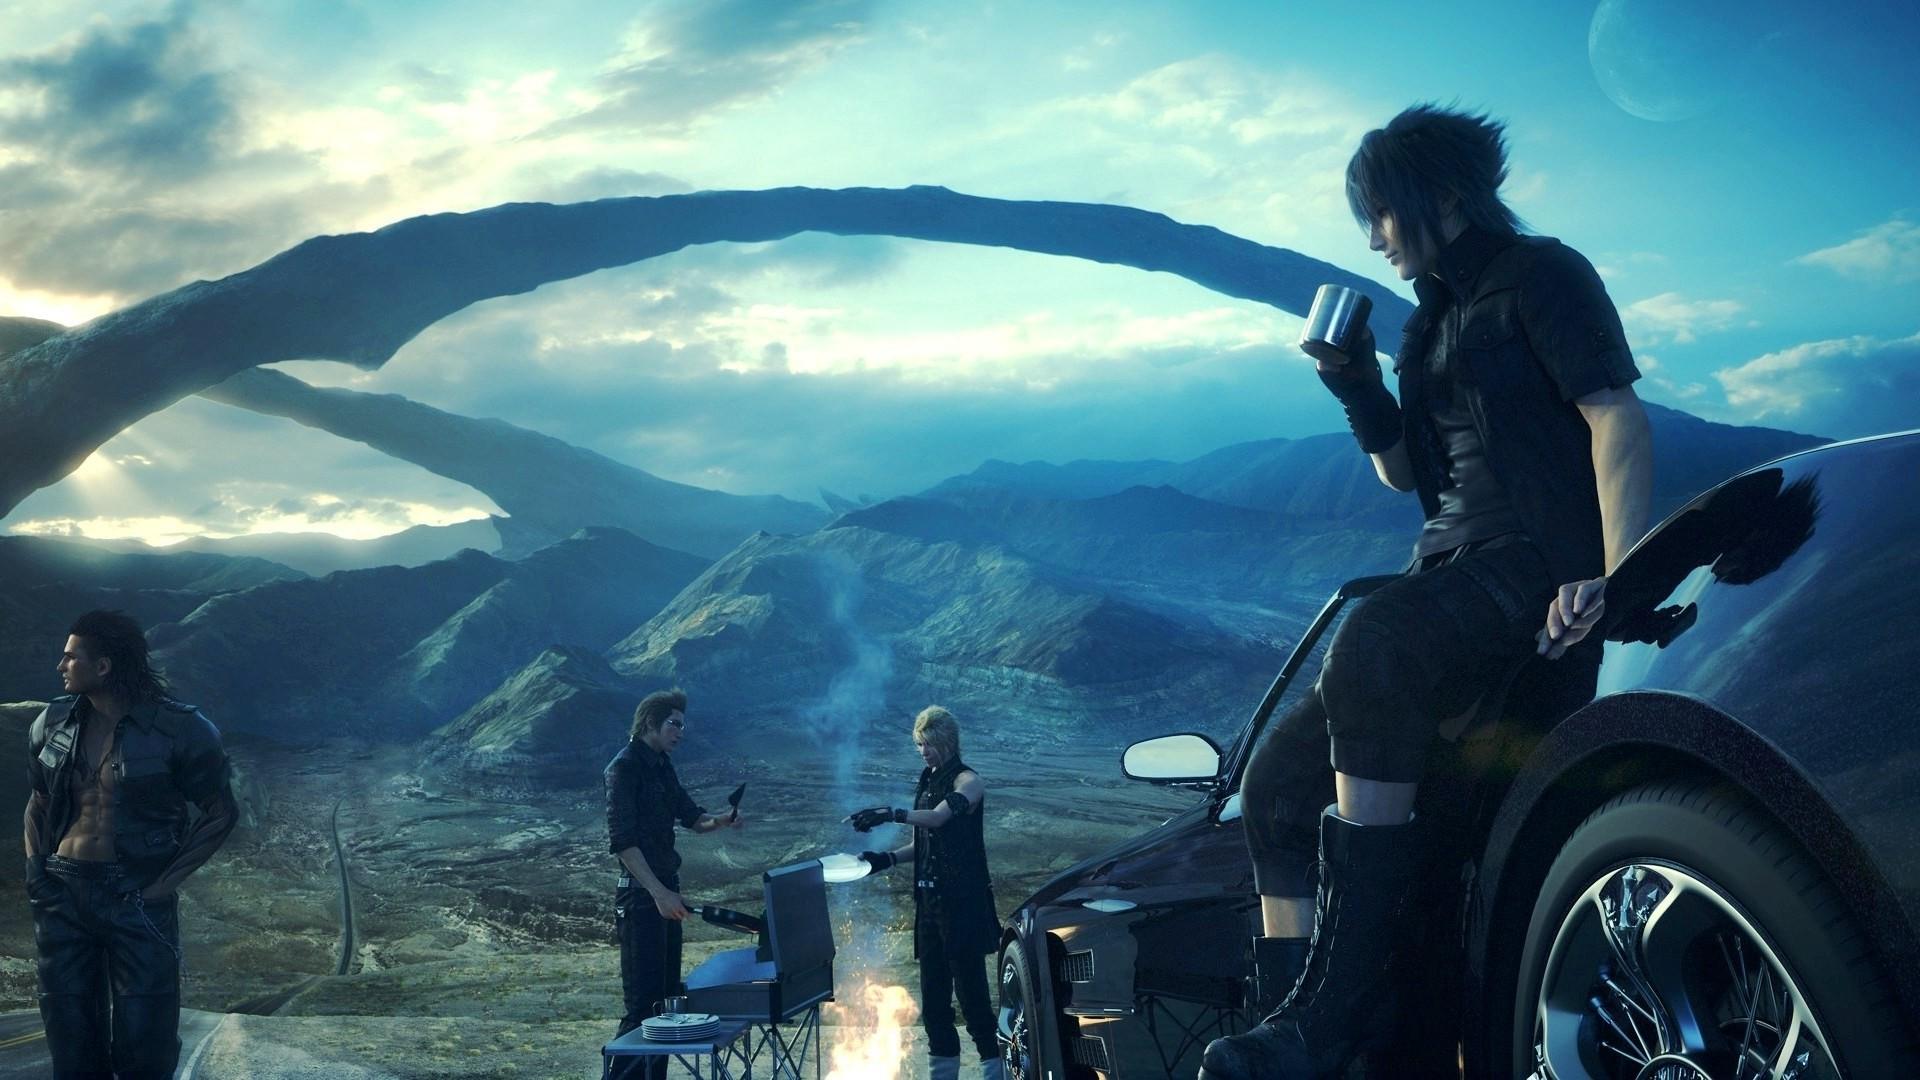 Final Fantasy XV Wallpaper Images